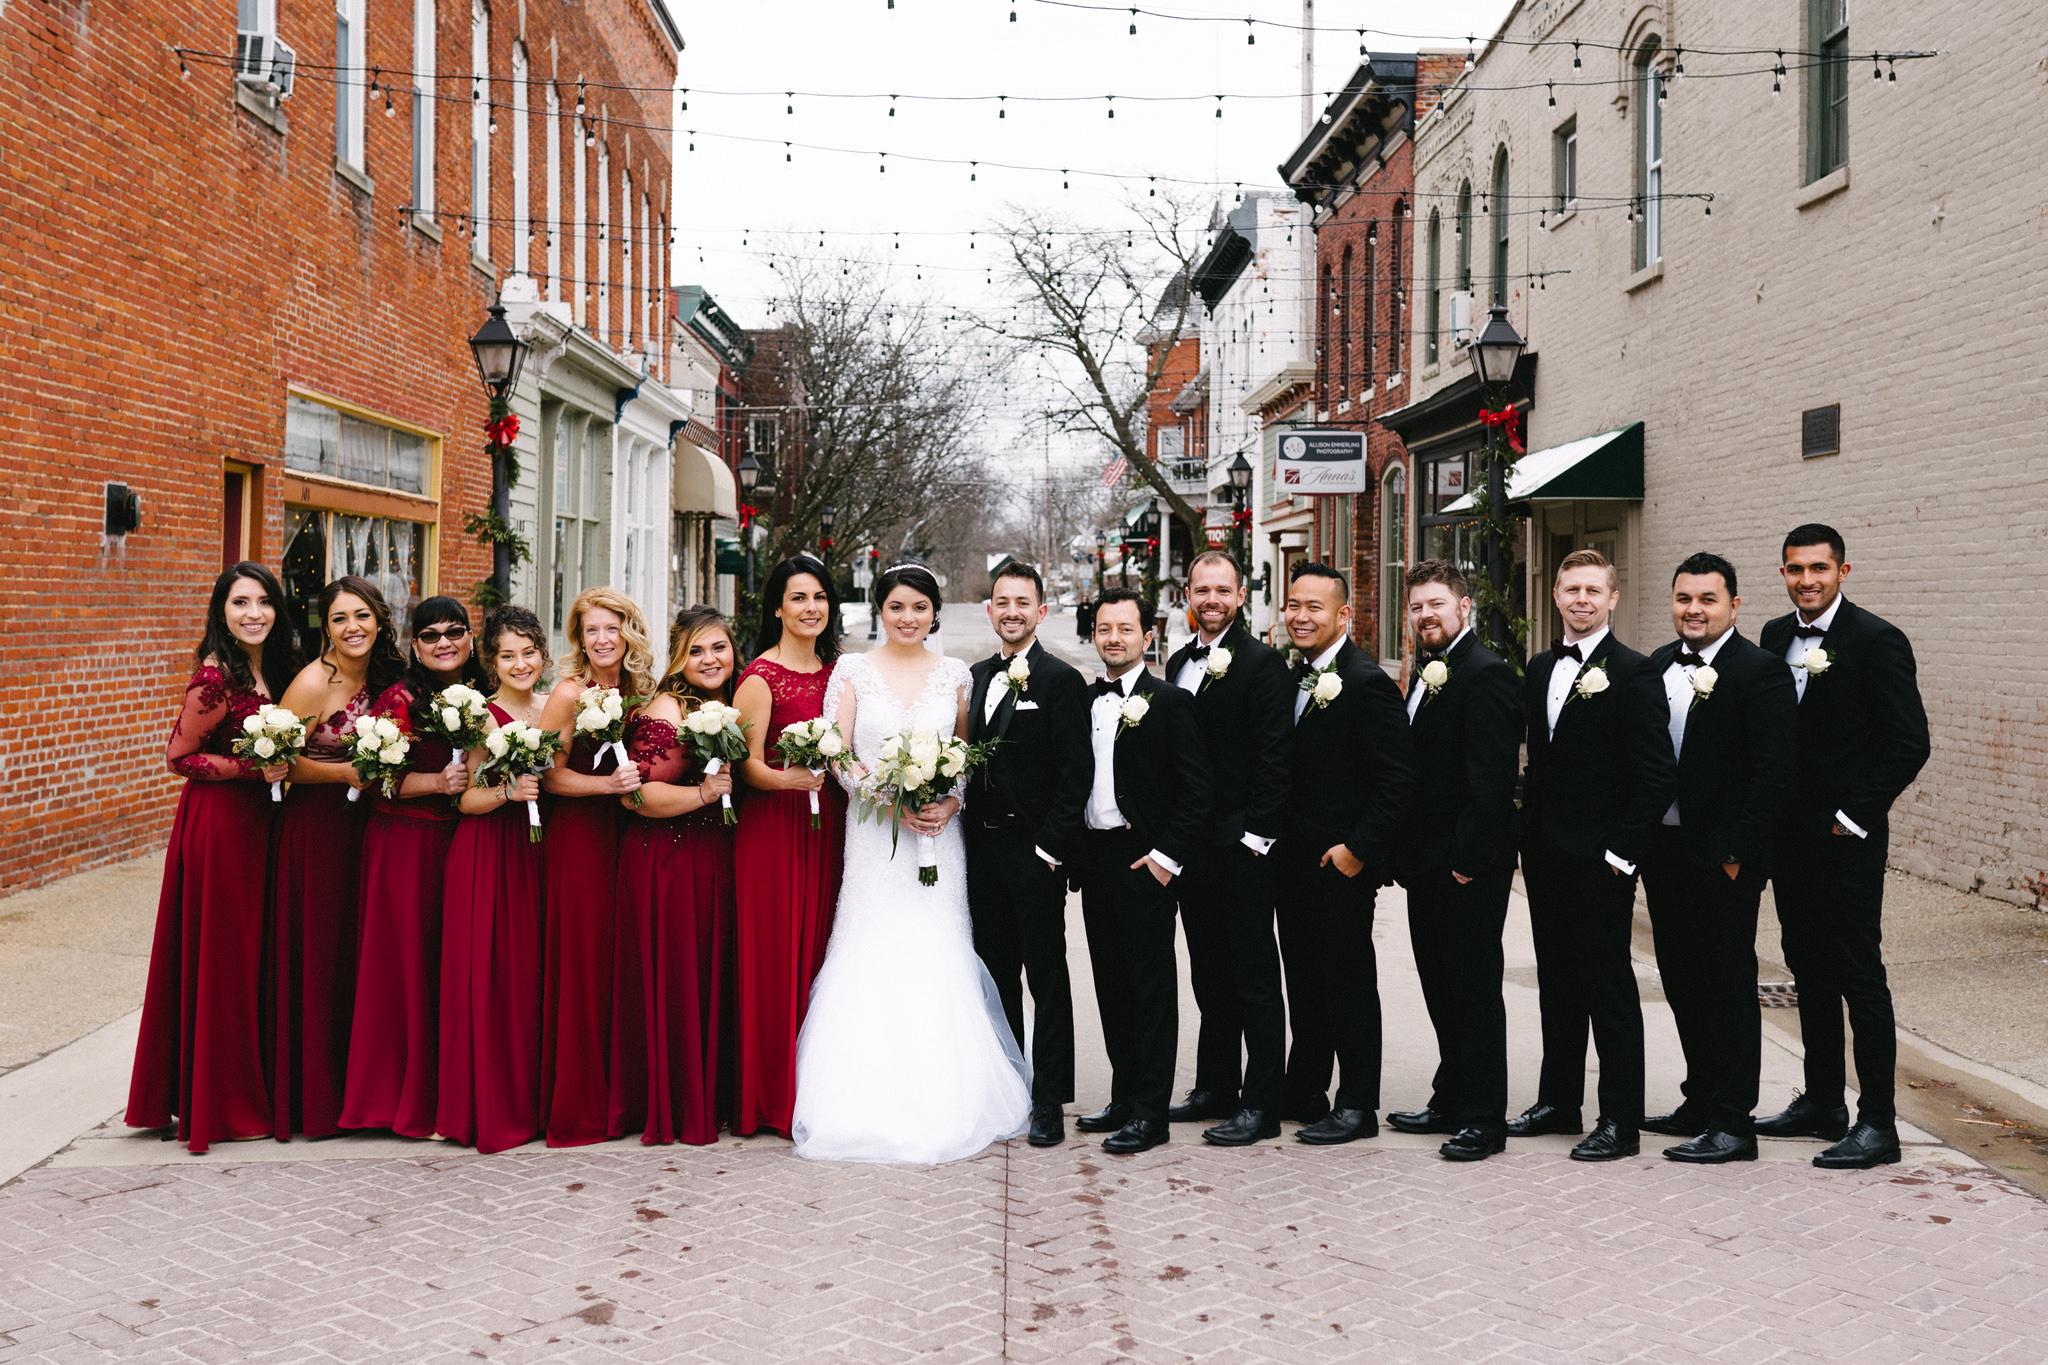 033-rempel-photography-chicago-wedding-inspiration-susan-daniel-michigan-metro-detroit-christian-church-holly-vault-cupcakes-and-kisses.jpg